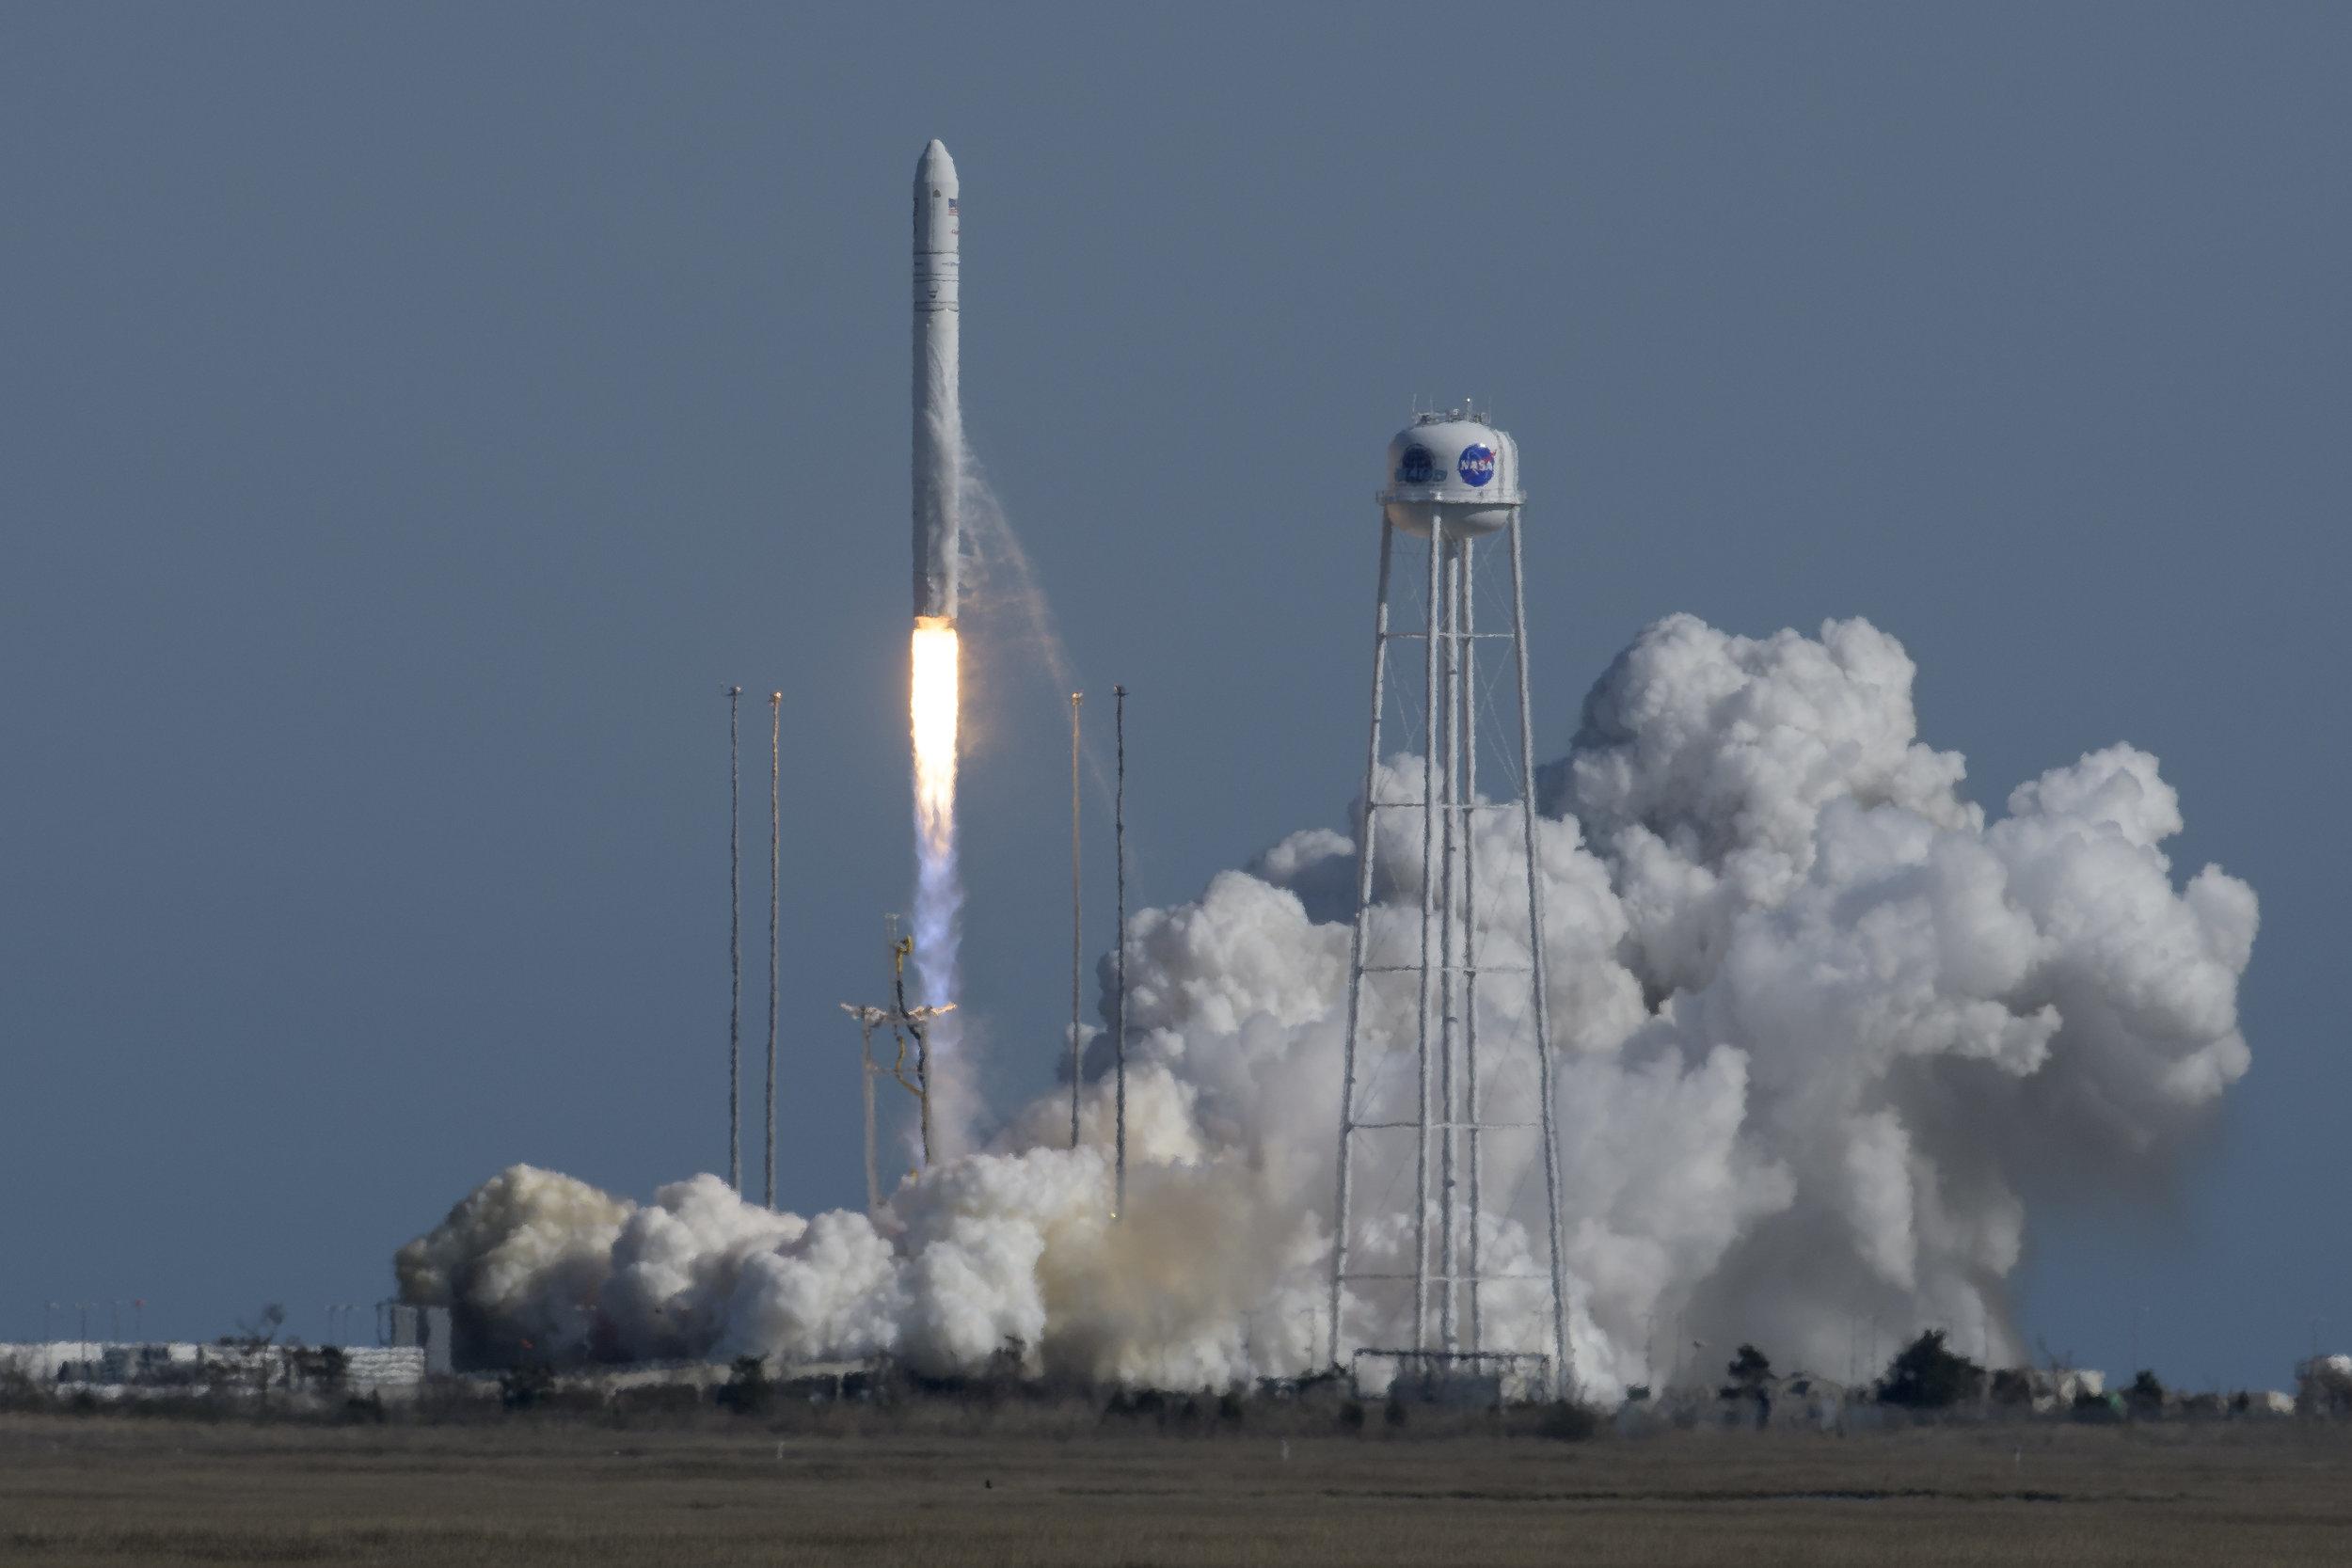 An Antares 230 rocket launches the NG-11 spacecraft into orbit. Credit: NASA/Bill Ingalls